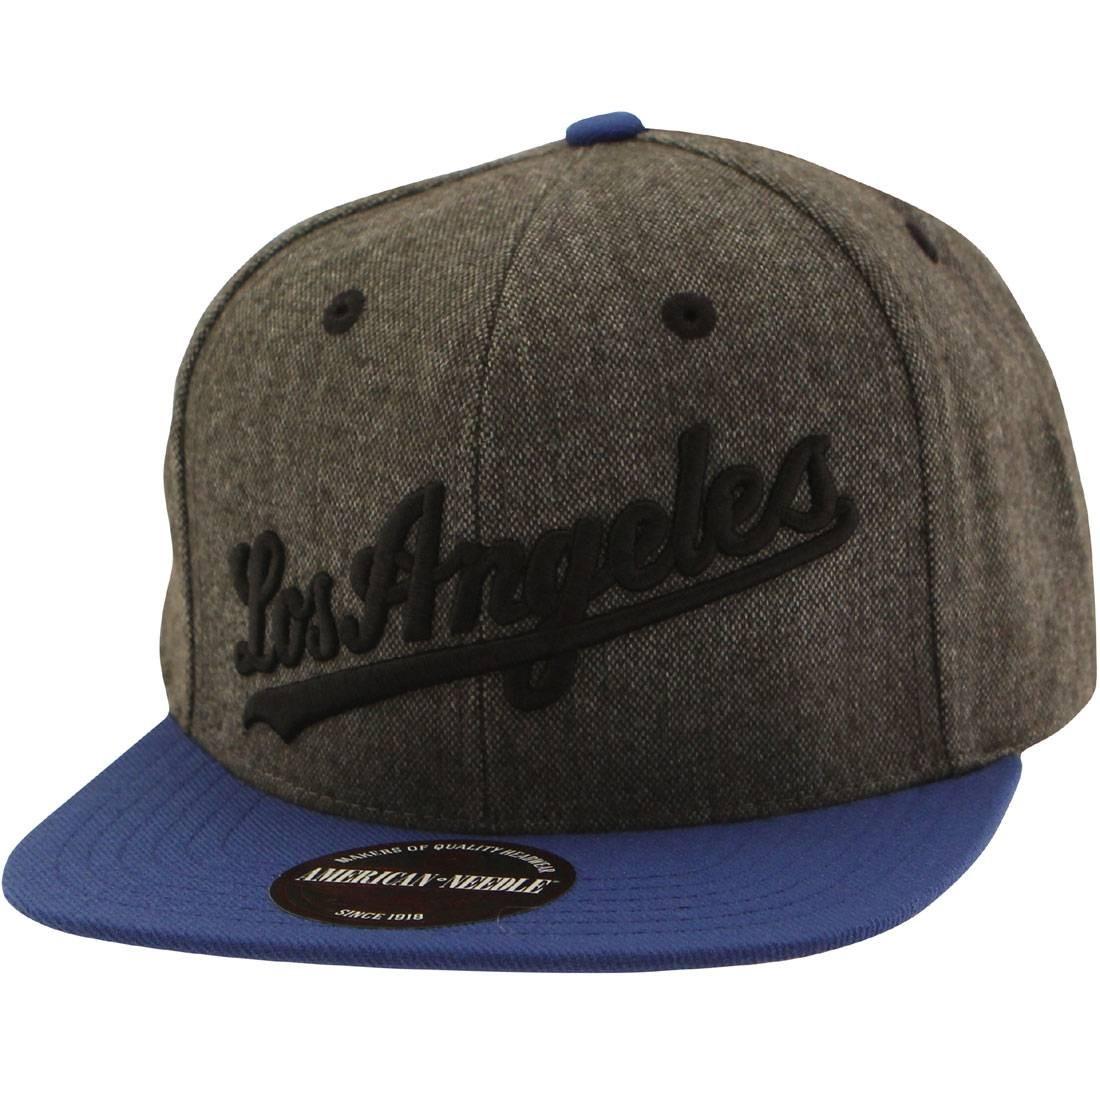 c3b09505be3e1 American Needle MLB Los Angeles Dodgers Snapback Cap - Flak brown royal